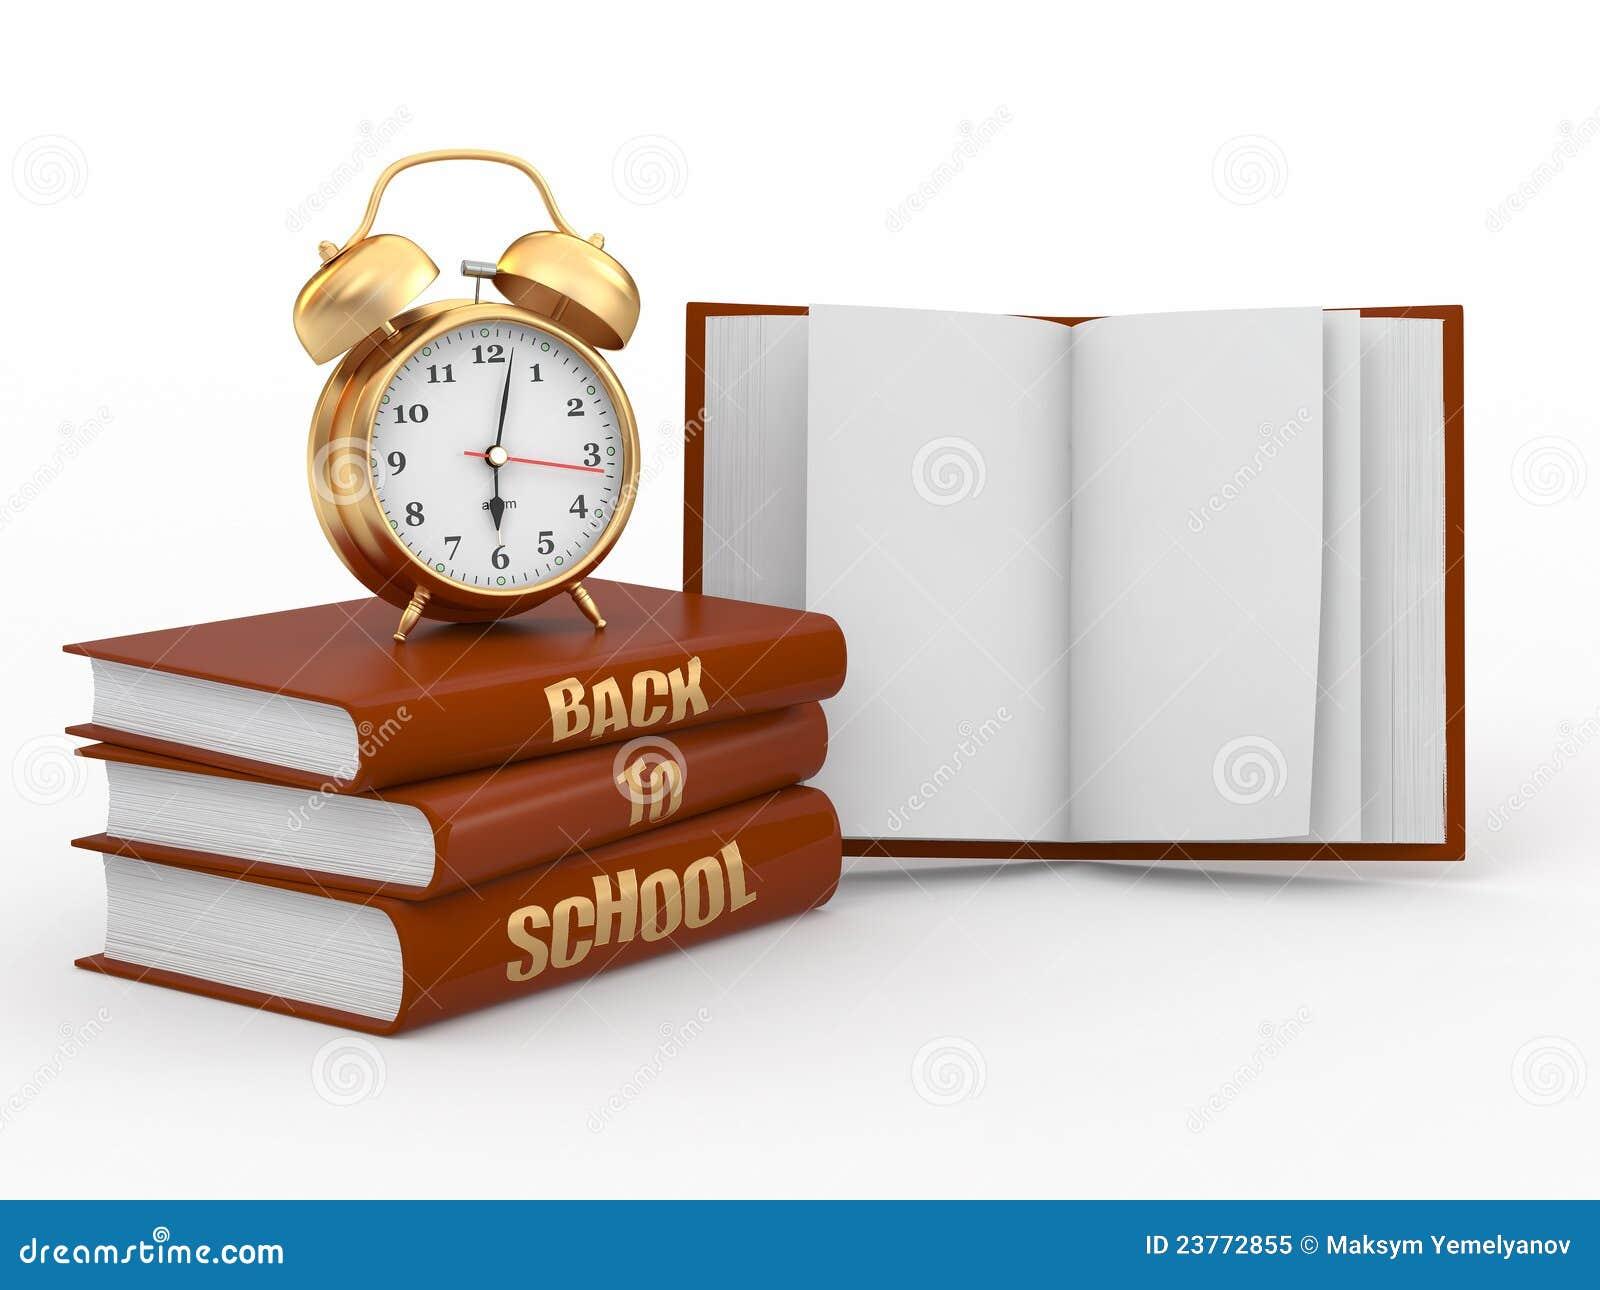 back to school  alarm clock on books  royalty free stock